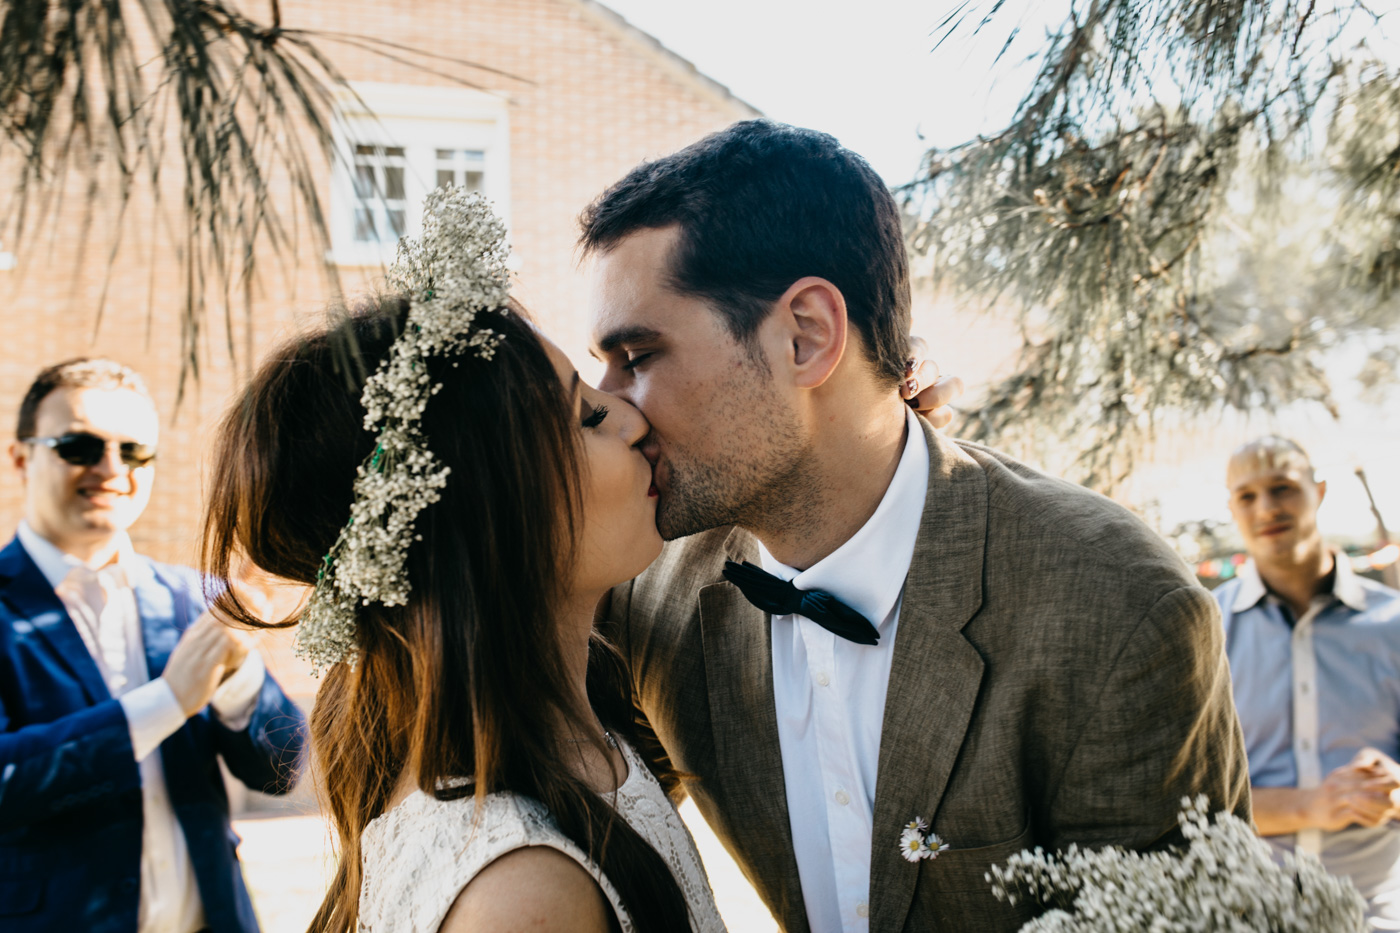 Velvet-Hush-fotografos-boda-al-aire-libre-madrid-039